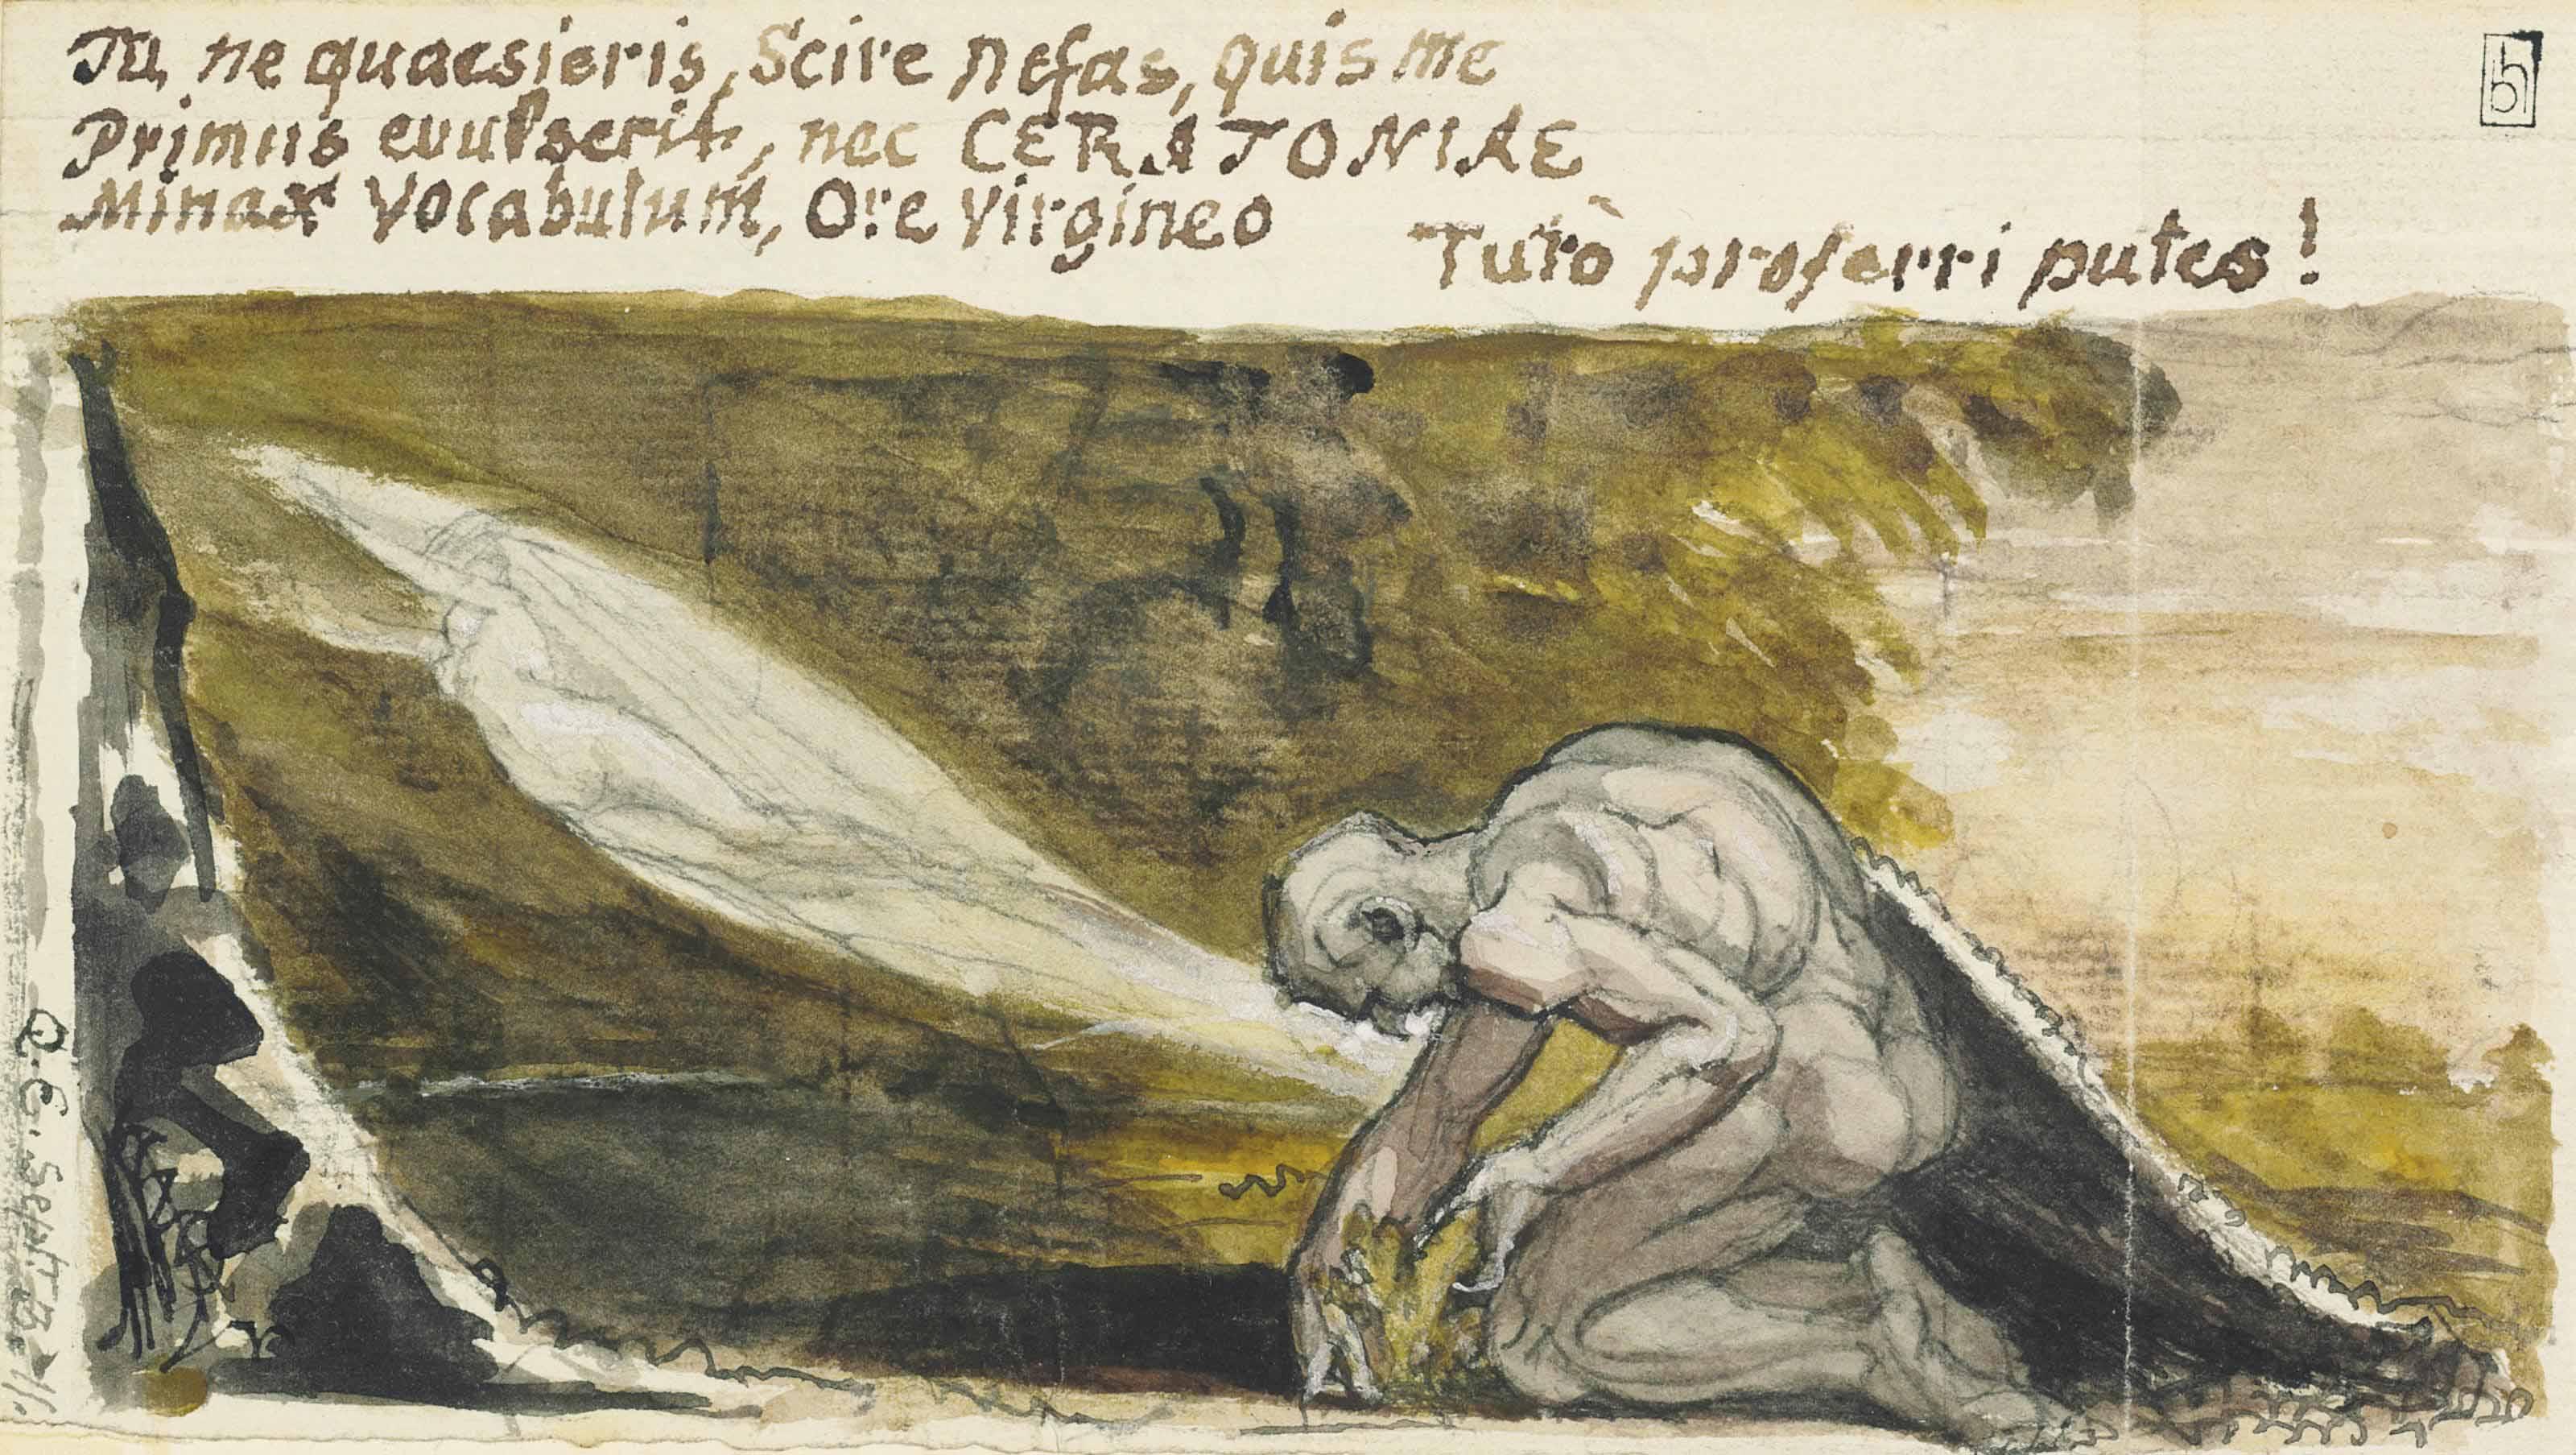 Johann Heinrich Füssli, Henry Fuseli, R.A. (Zurich 1741 - 1825 Putney Hill)